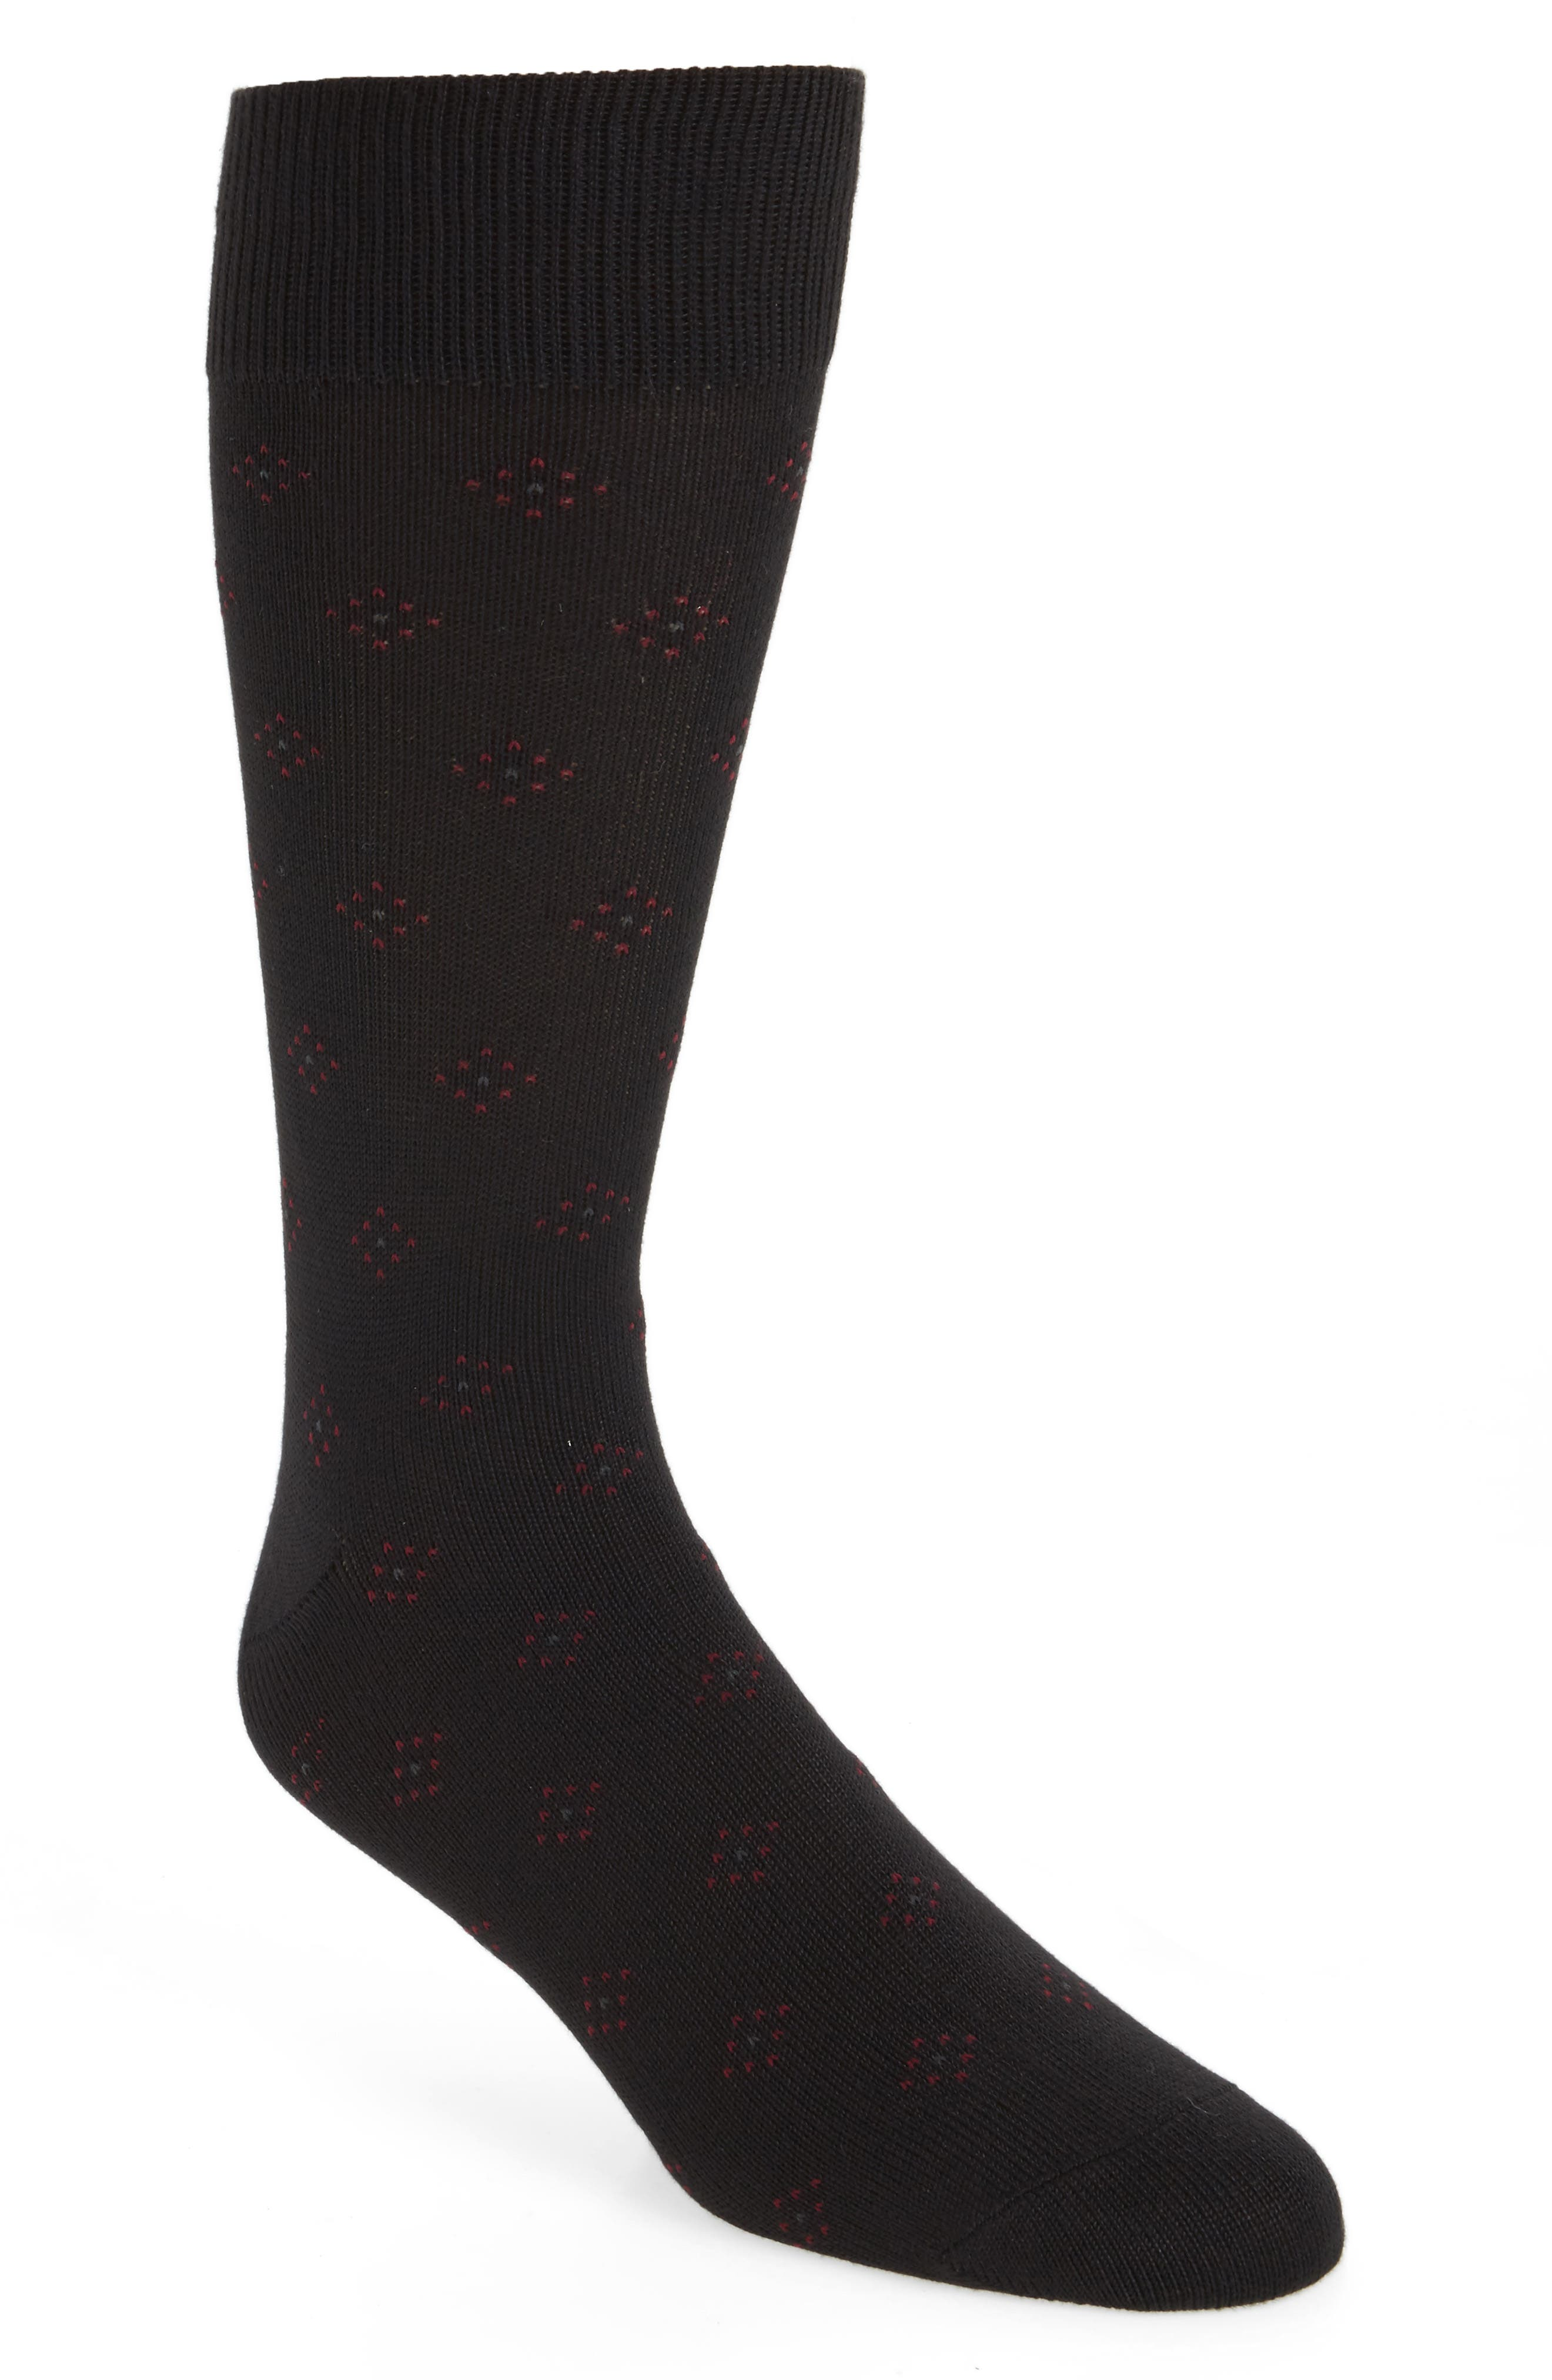 Ultra Soft Neat Socks,                         Main,                         color, Black